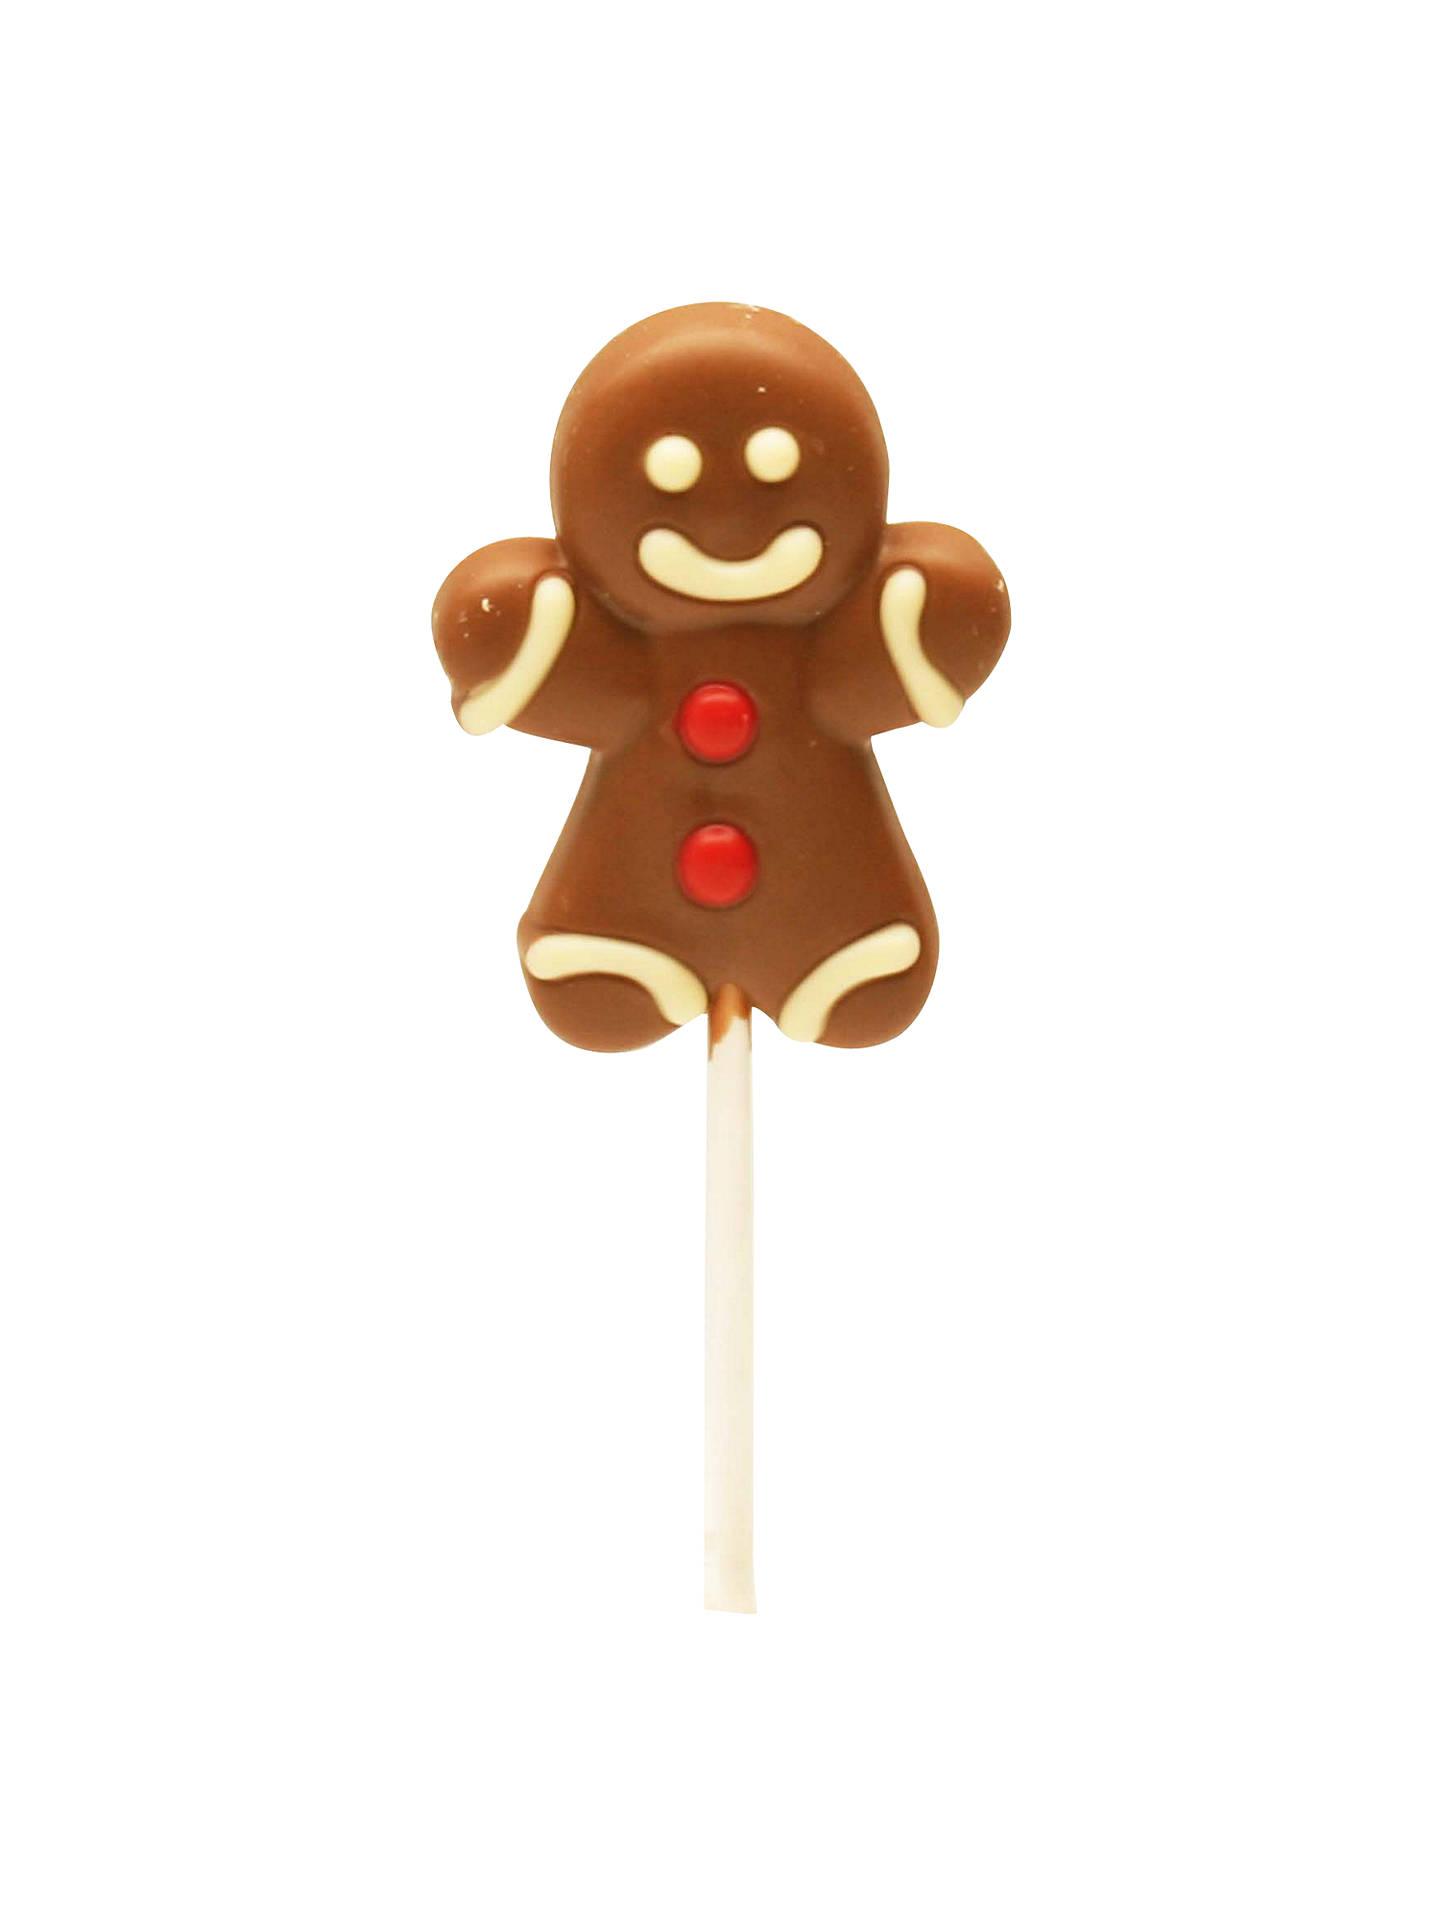 Natalie Milk Chocolate Gingerbread Man Lollipop 30g